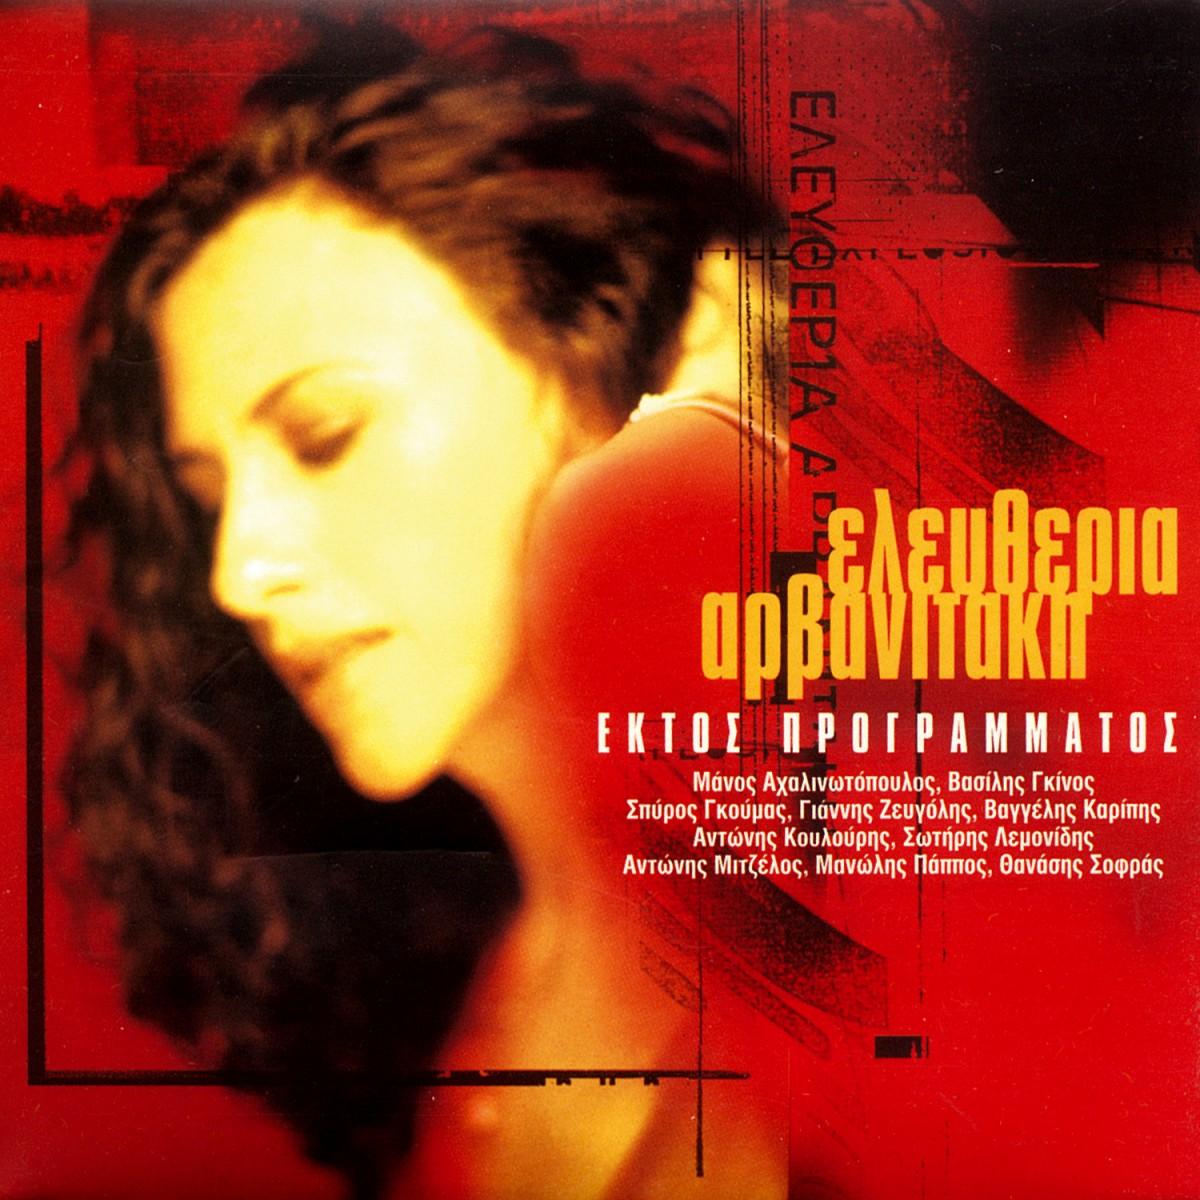 Arvanitaki, Eleftheria: Ektos Programmatos (1998)